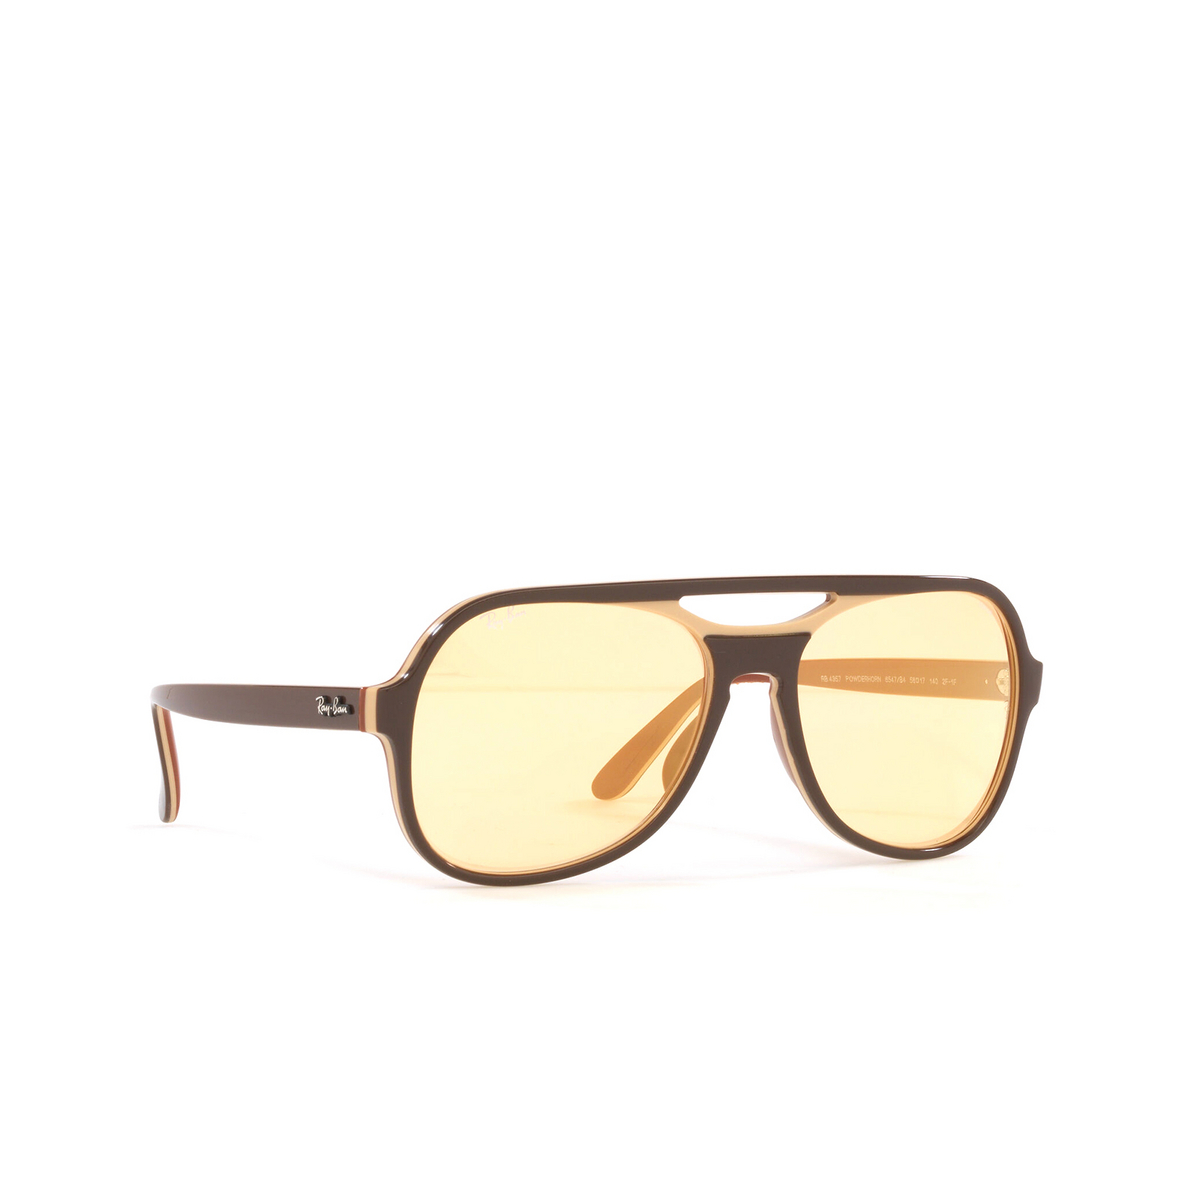 Ray-Ban® Aviator Sunglasses: Powderhorn RB4357 color Dark Brown Light Brown 6547B4 - three-quarters view.